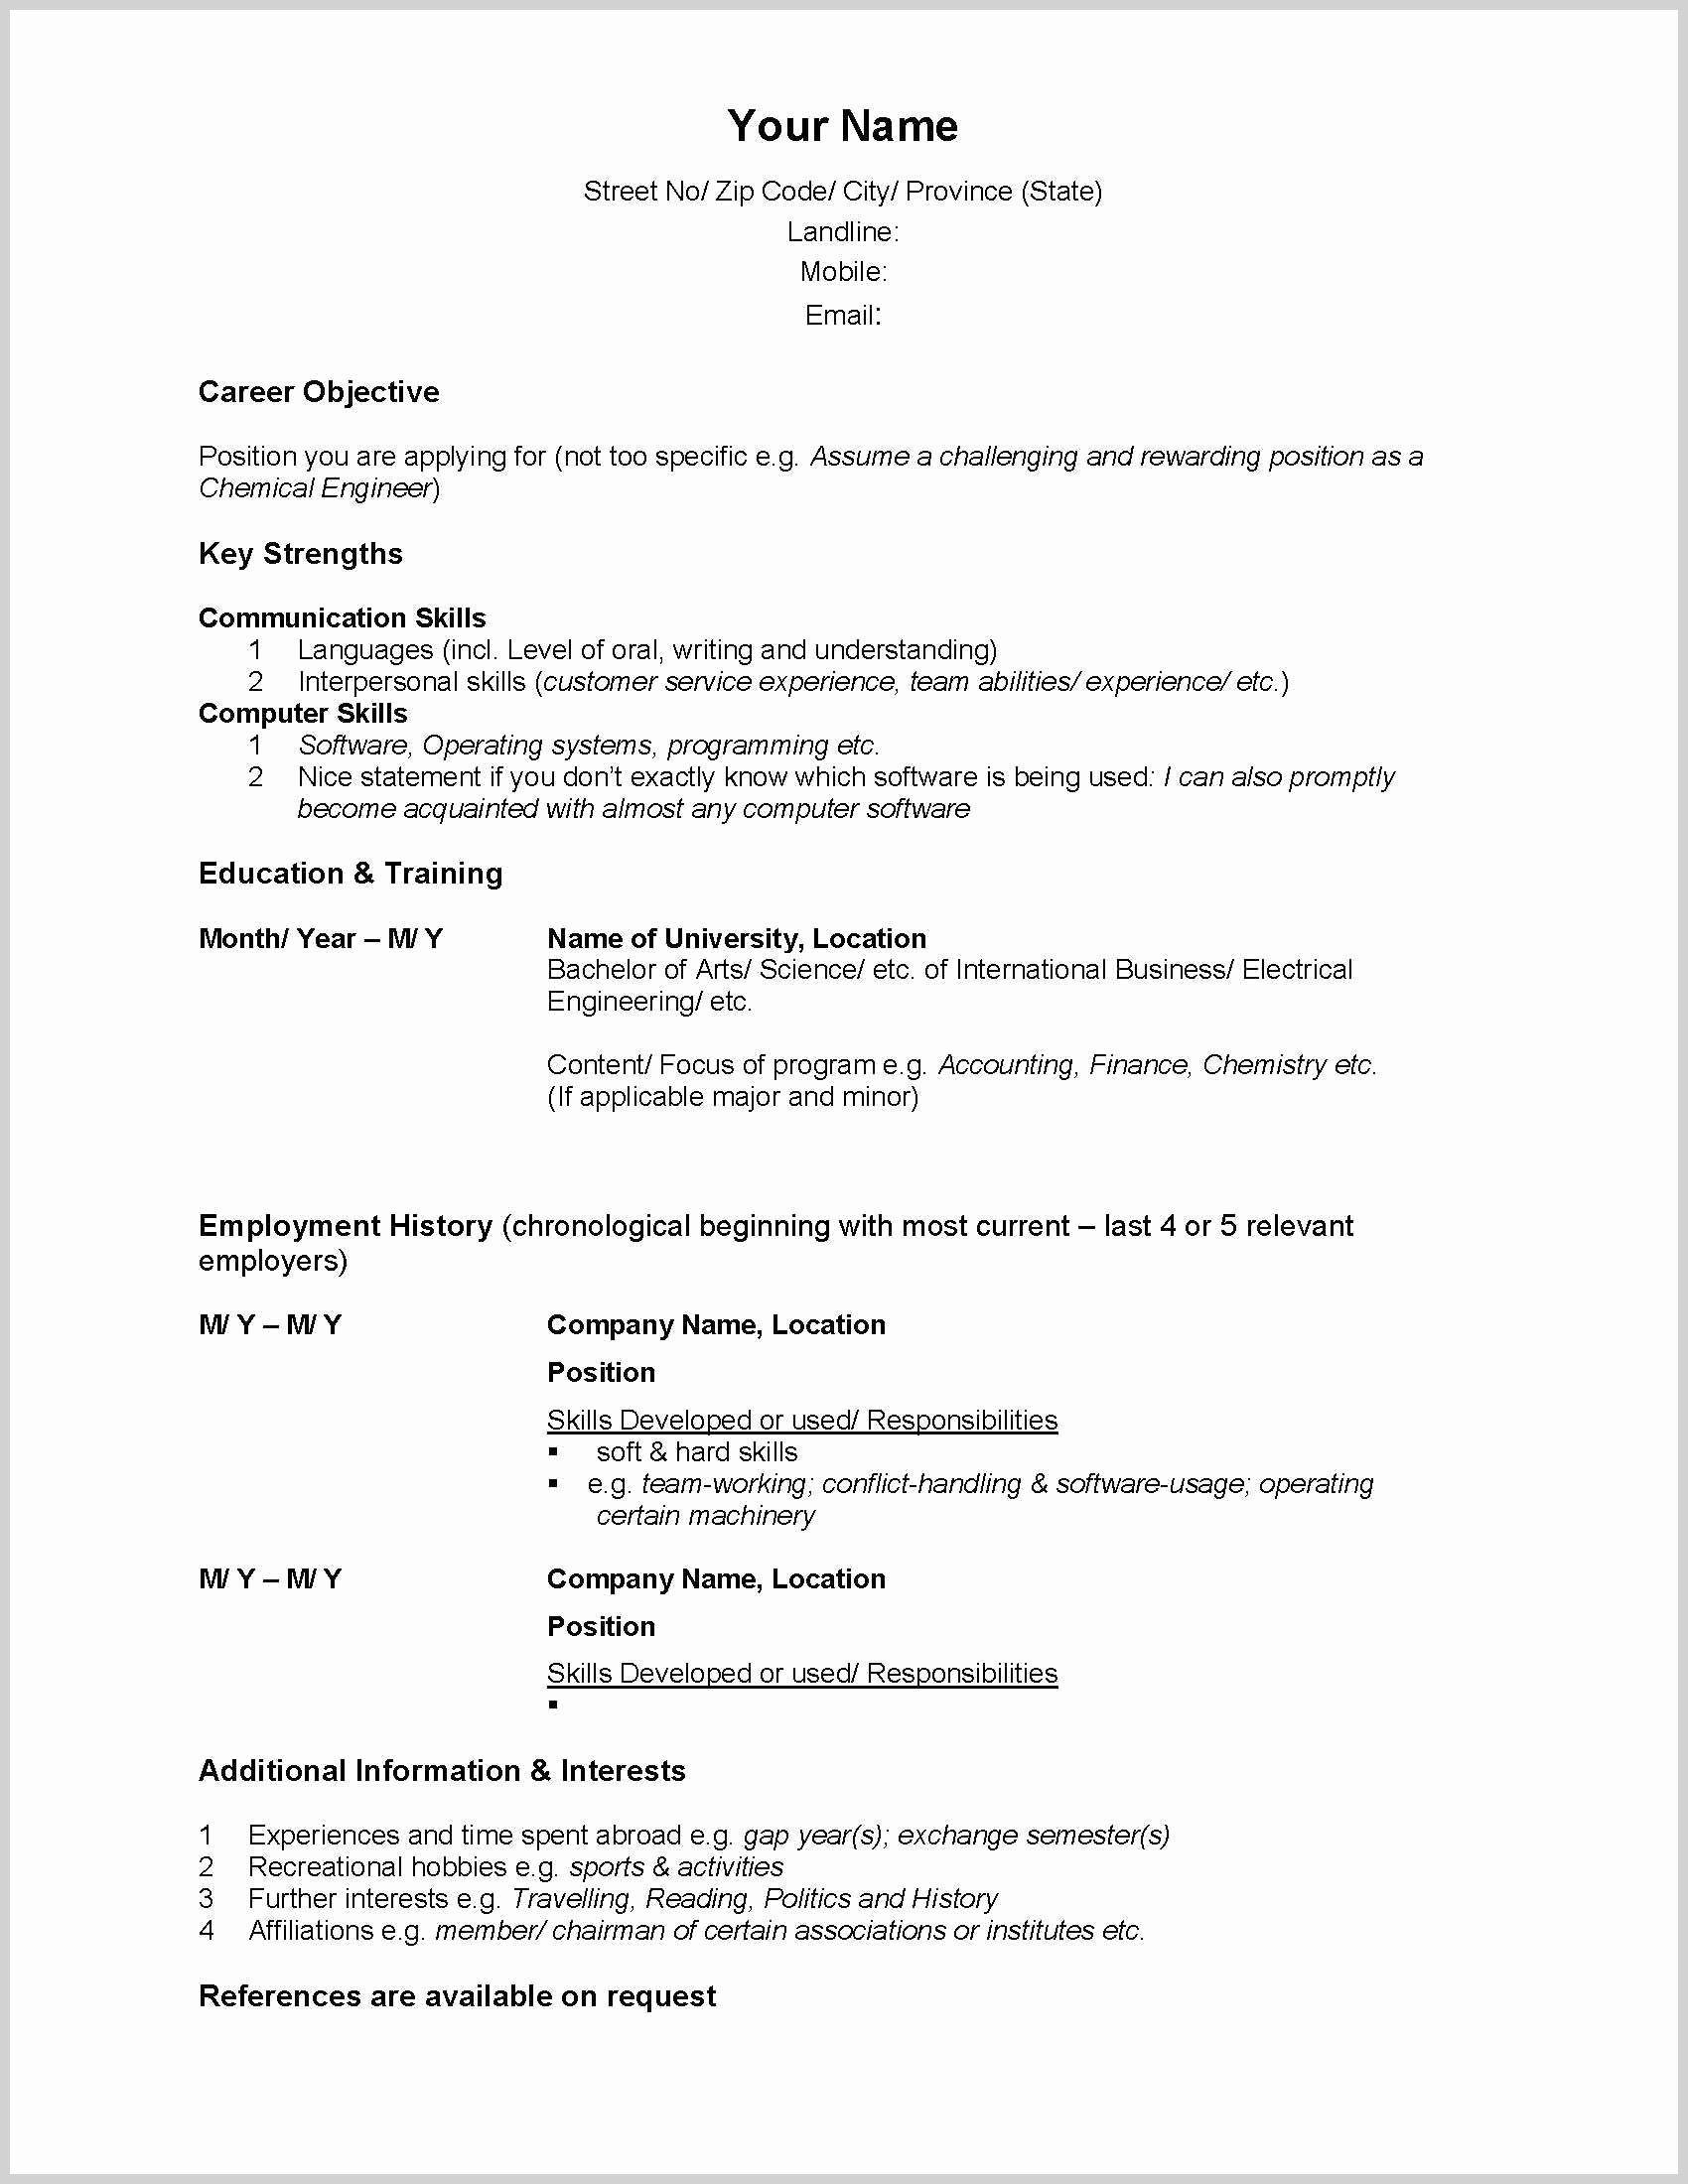 Resume Templates Skills 6 Templates Example Templates Example Resume Skills Resume Template Resume Profile